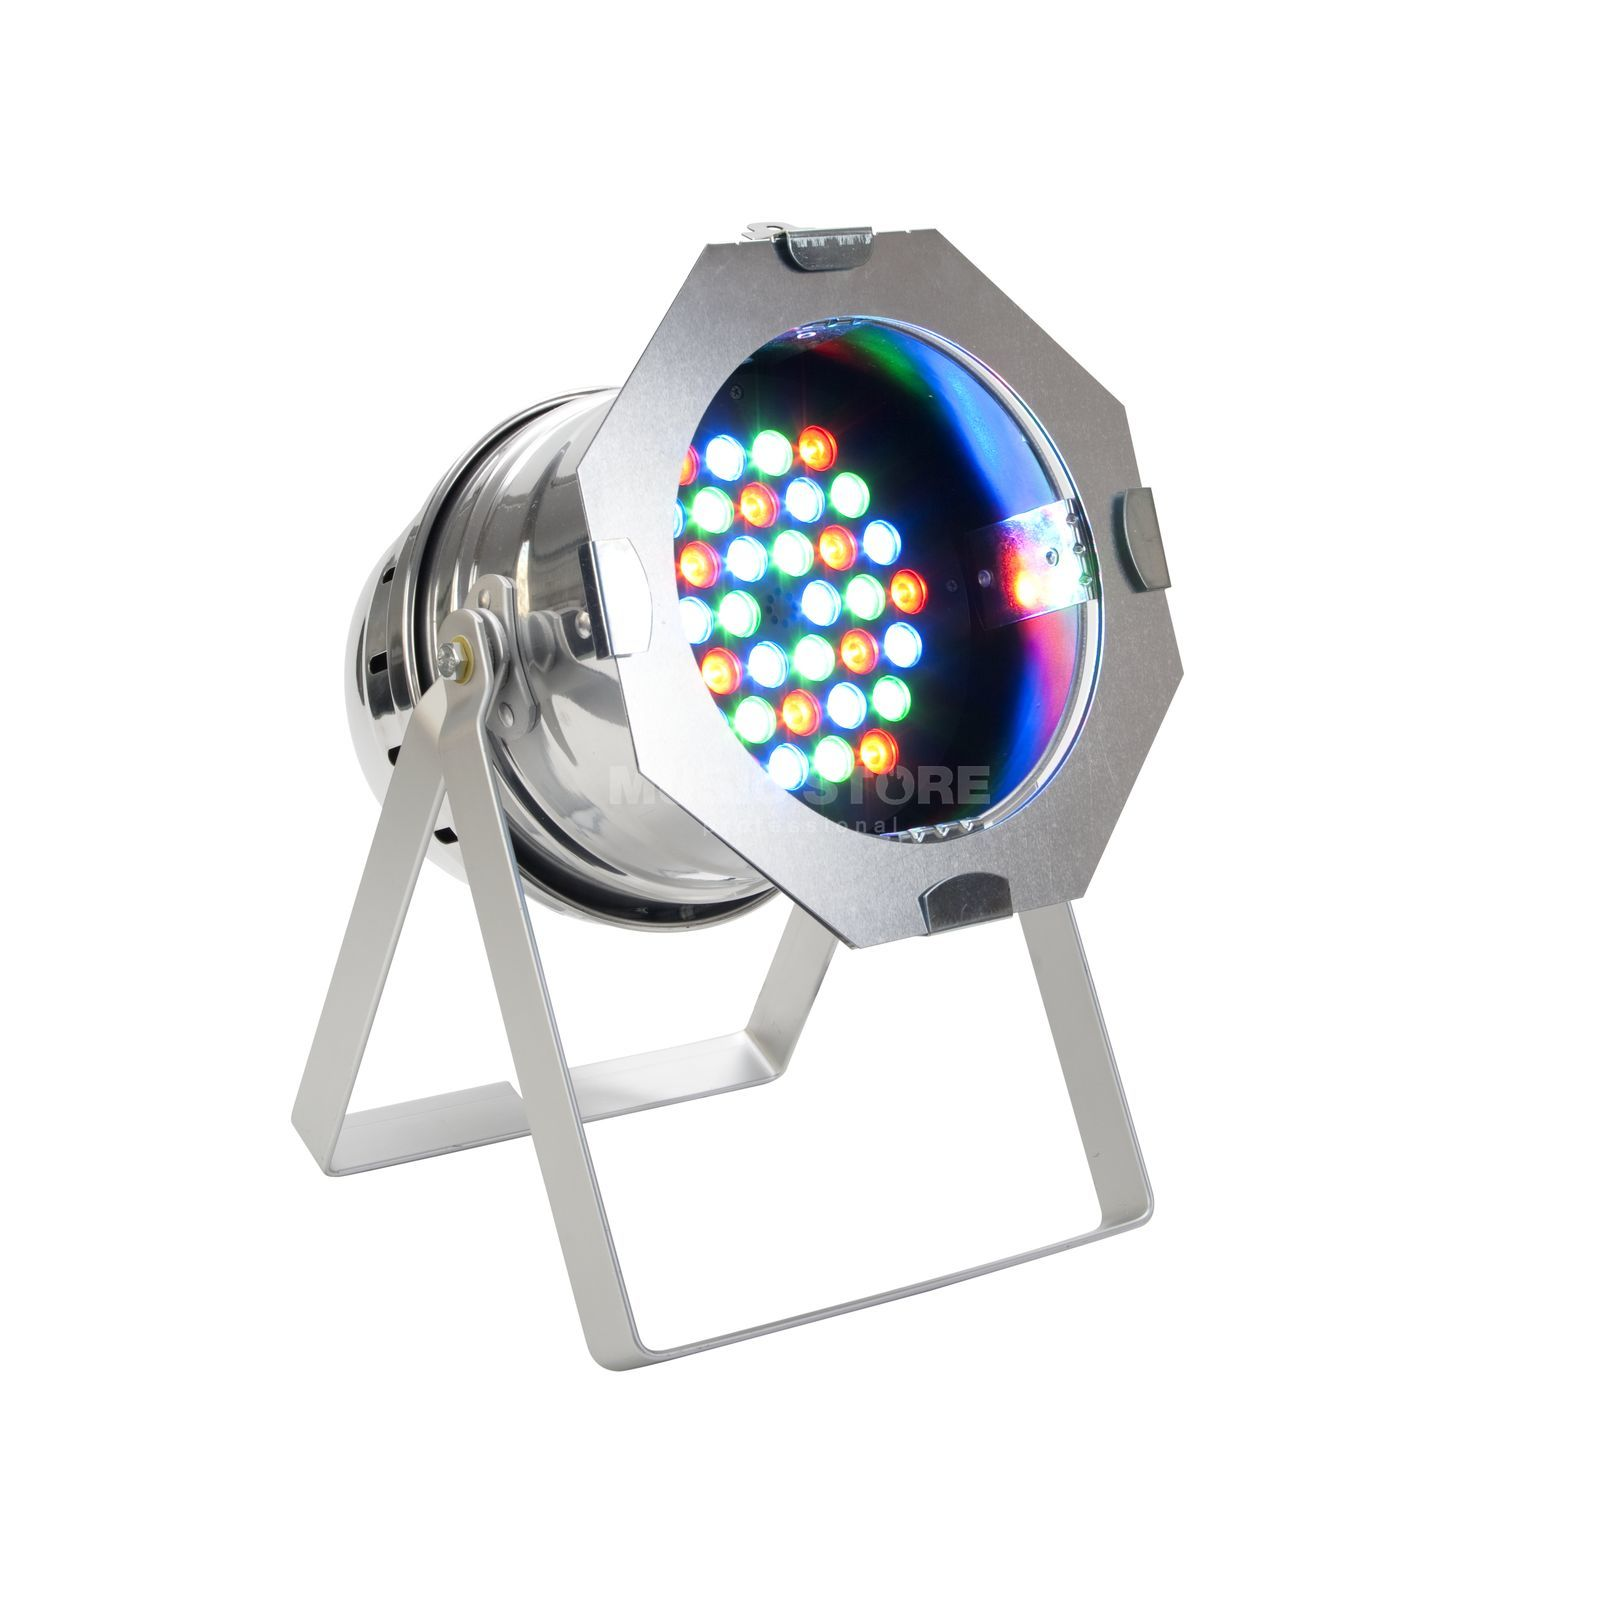 lightmaxx-led-par-64-highpower-mkii-36x1w-rgb-leds-polished-short_1_LIG0004928-000 Elegantes High Power Led Dekorationen